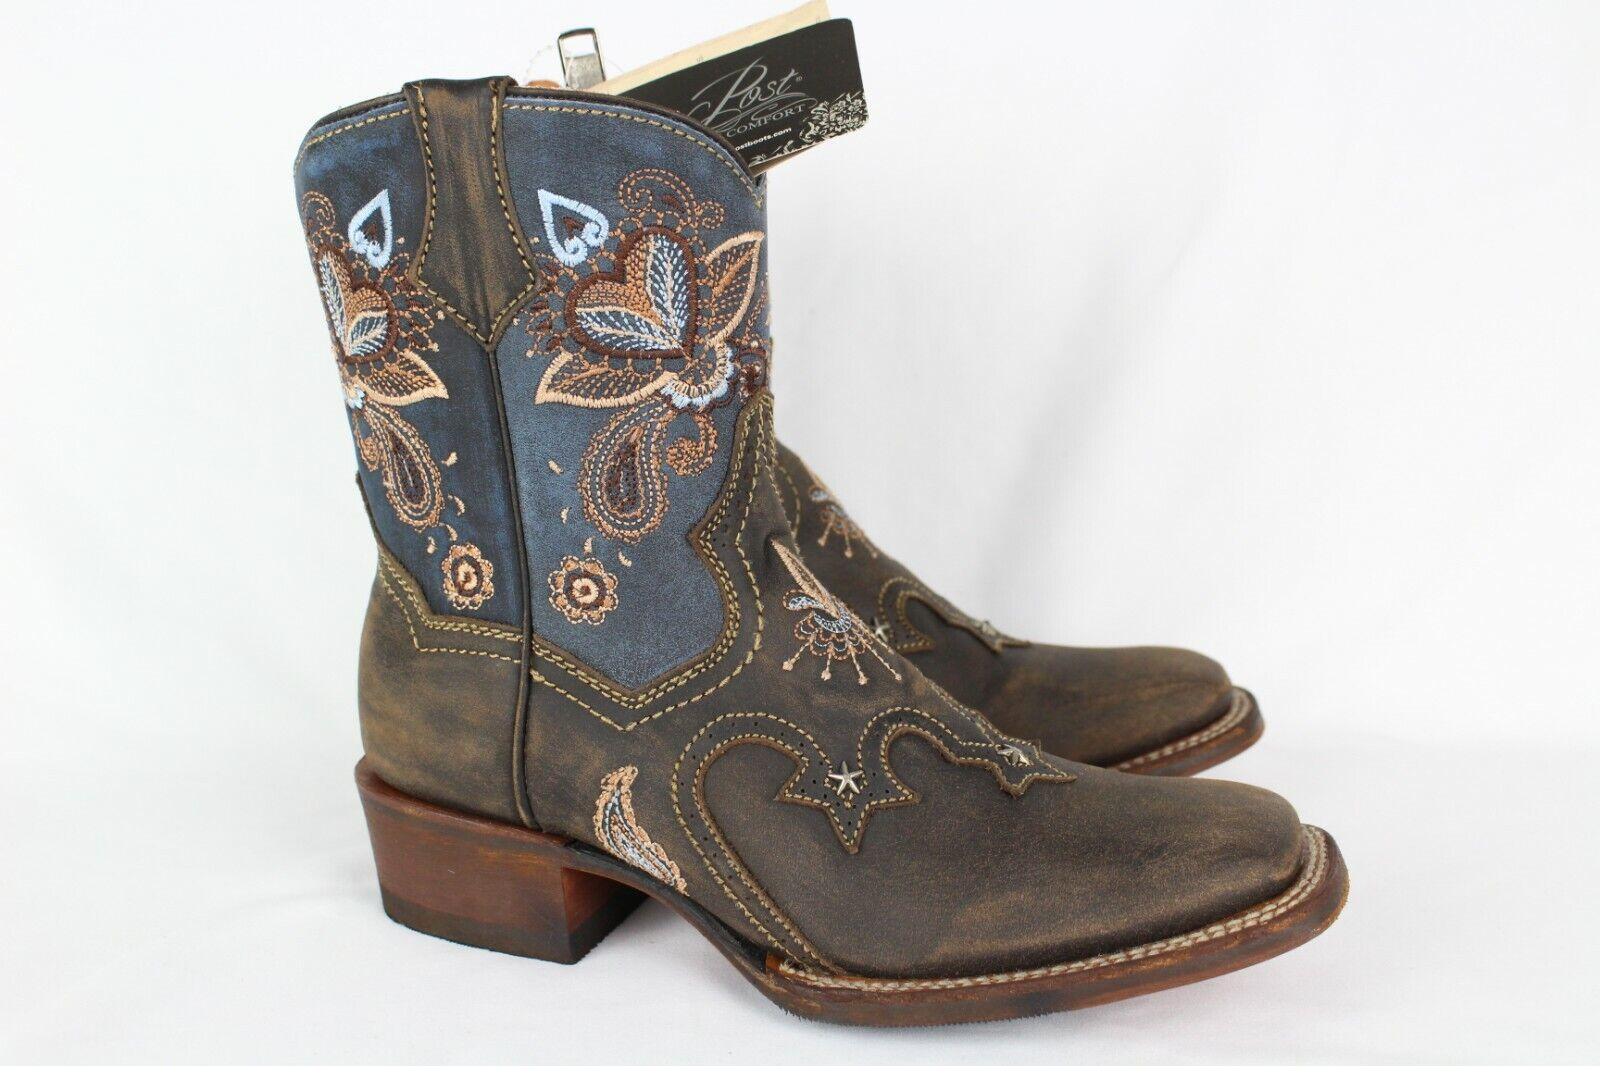 negozio online New Dan Post Donna  Cowgirl Certified Stars & & & Lilies stivali 7.5 Denim Choc  5282  vendita online risparmia il 70%